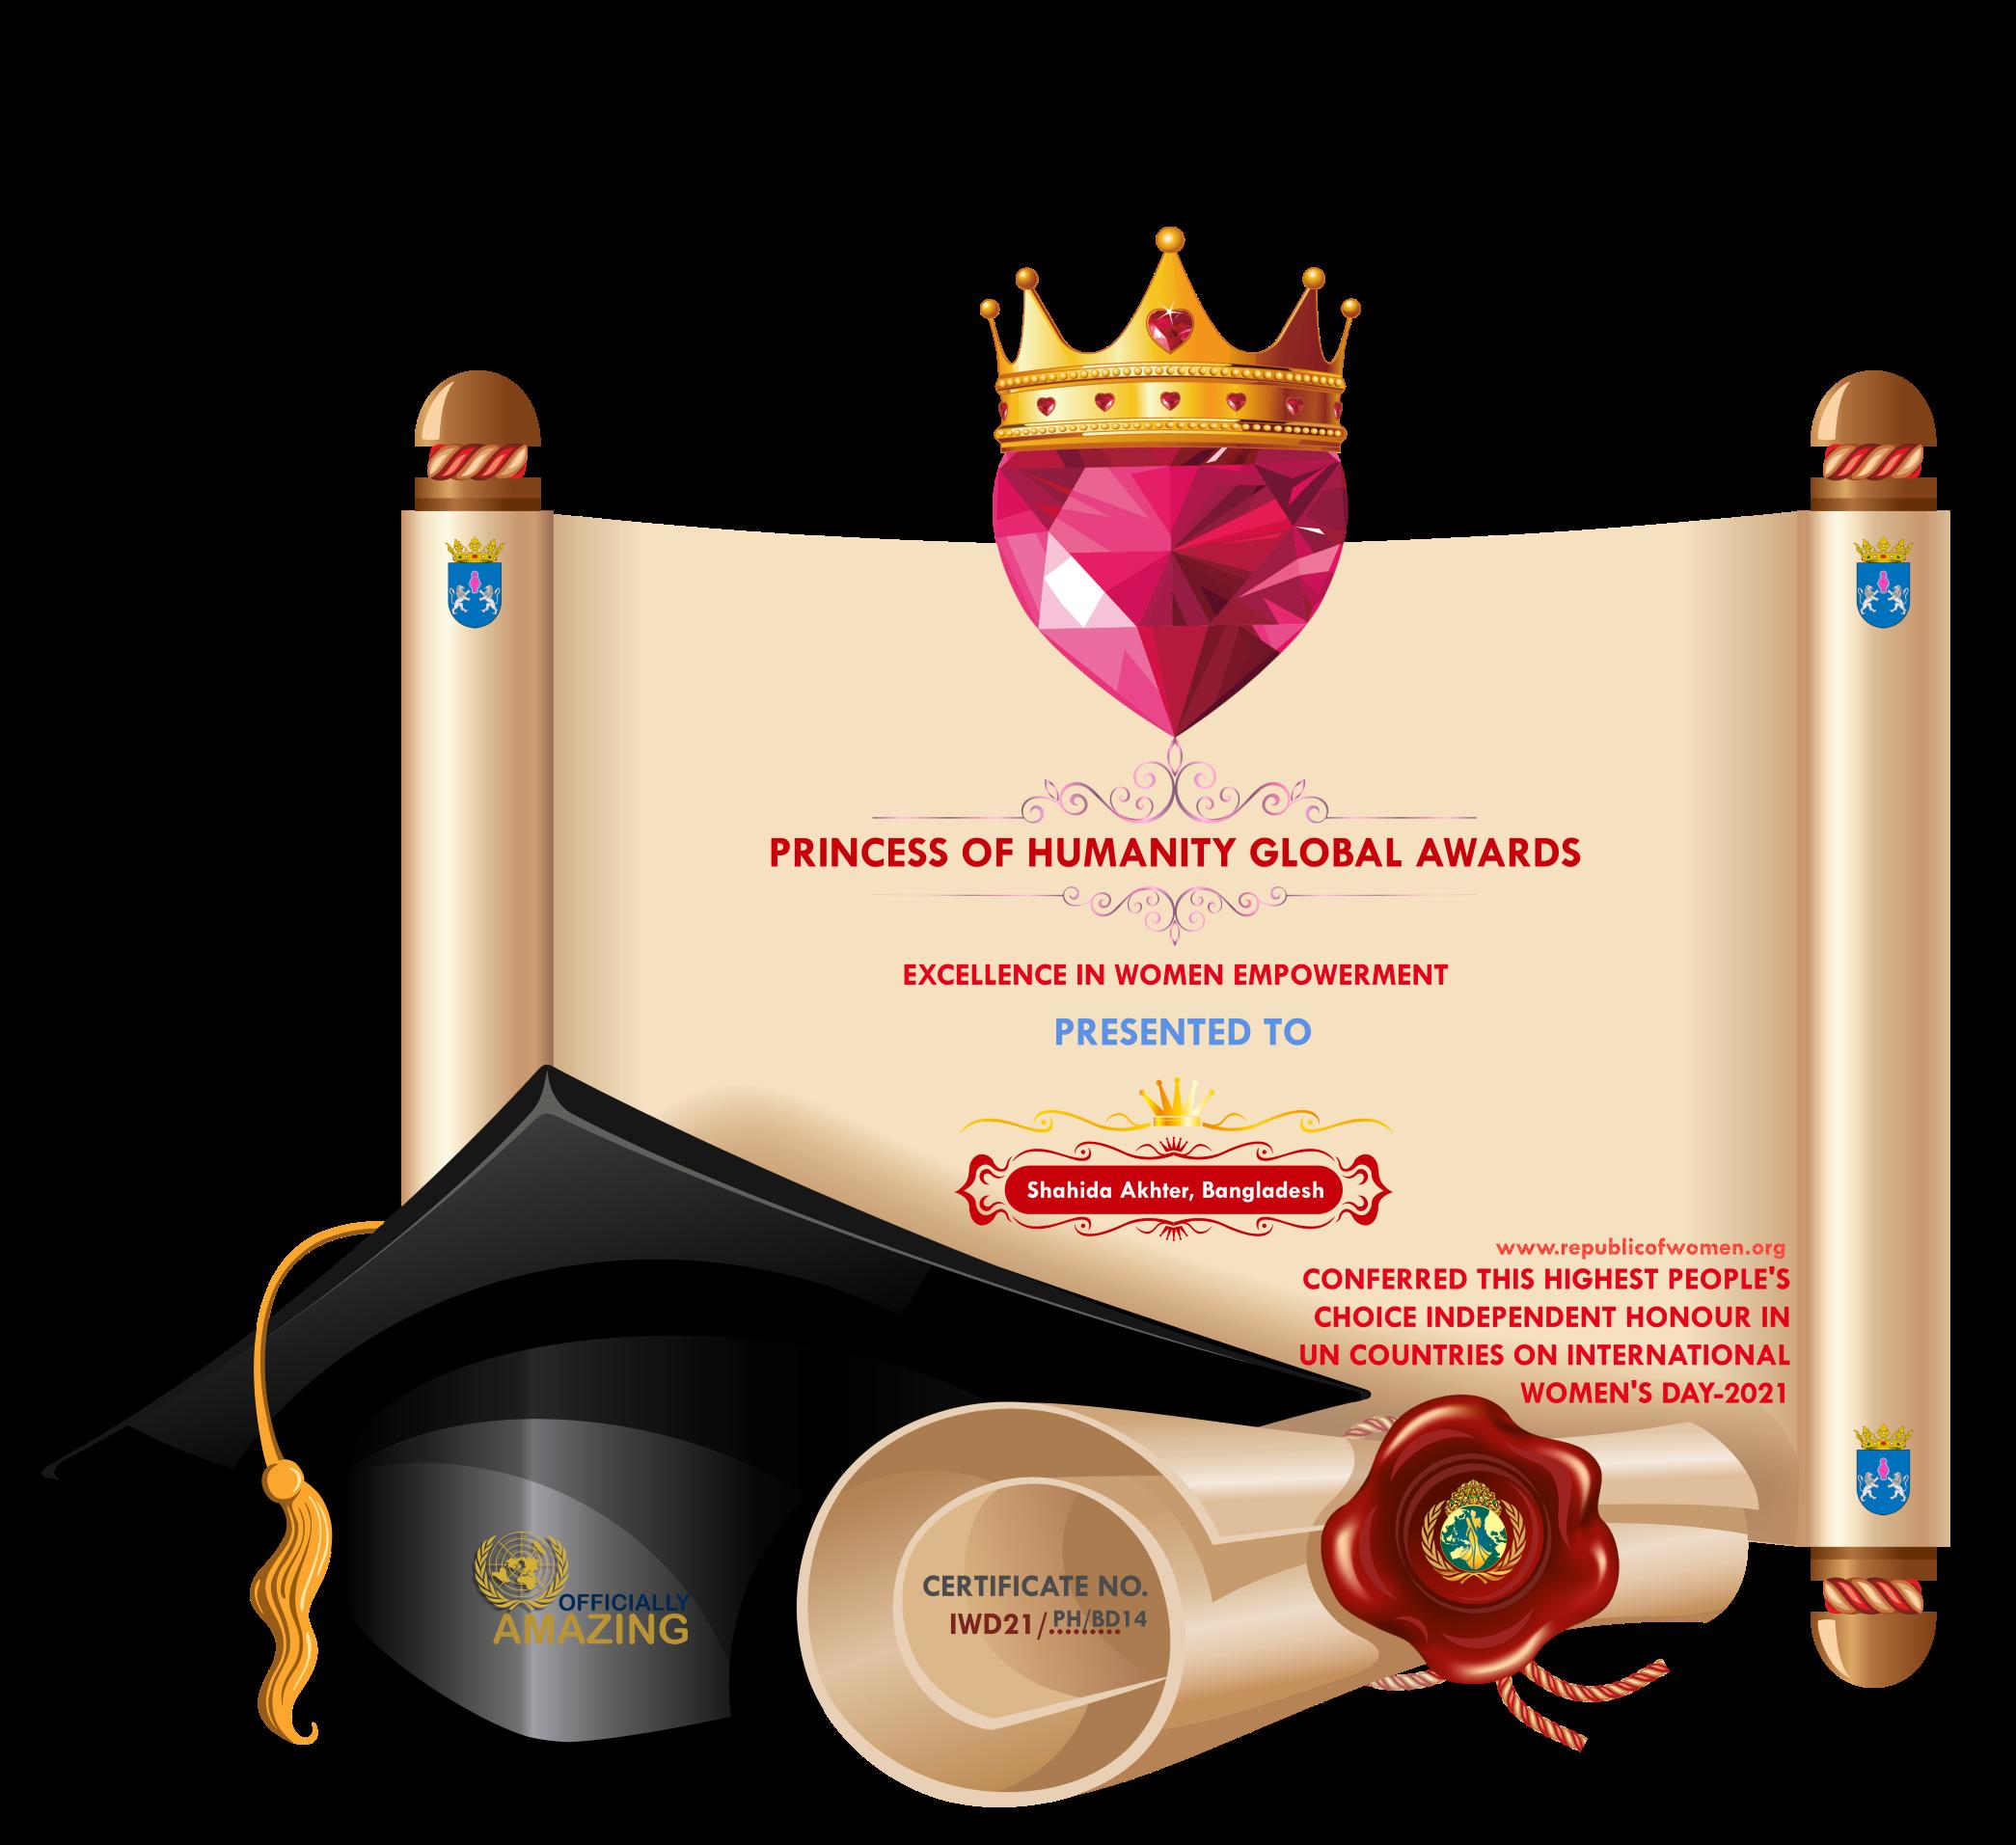 Award on International Women's Day 2021